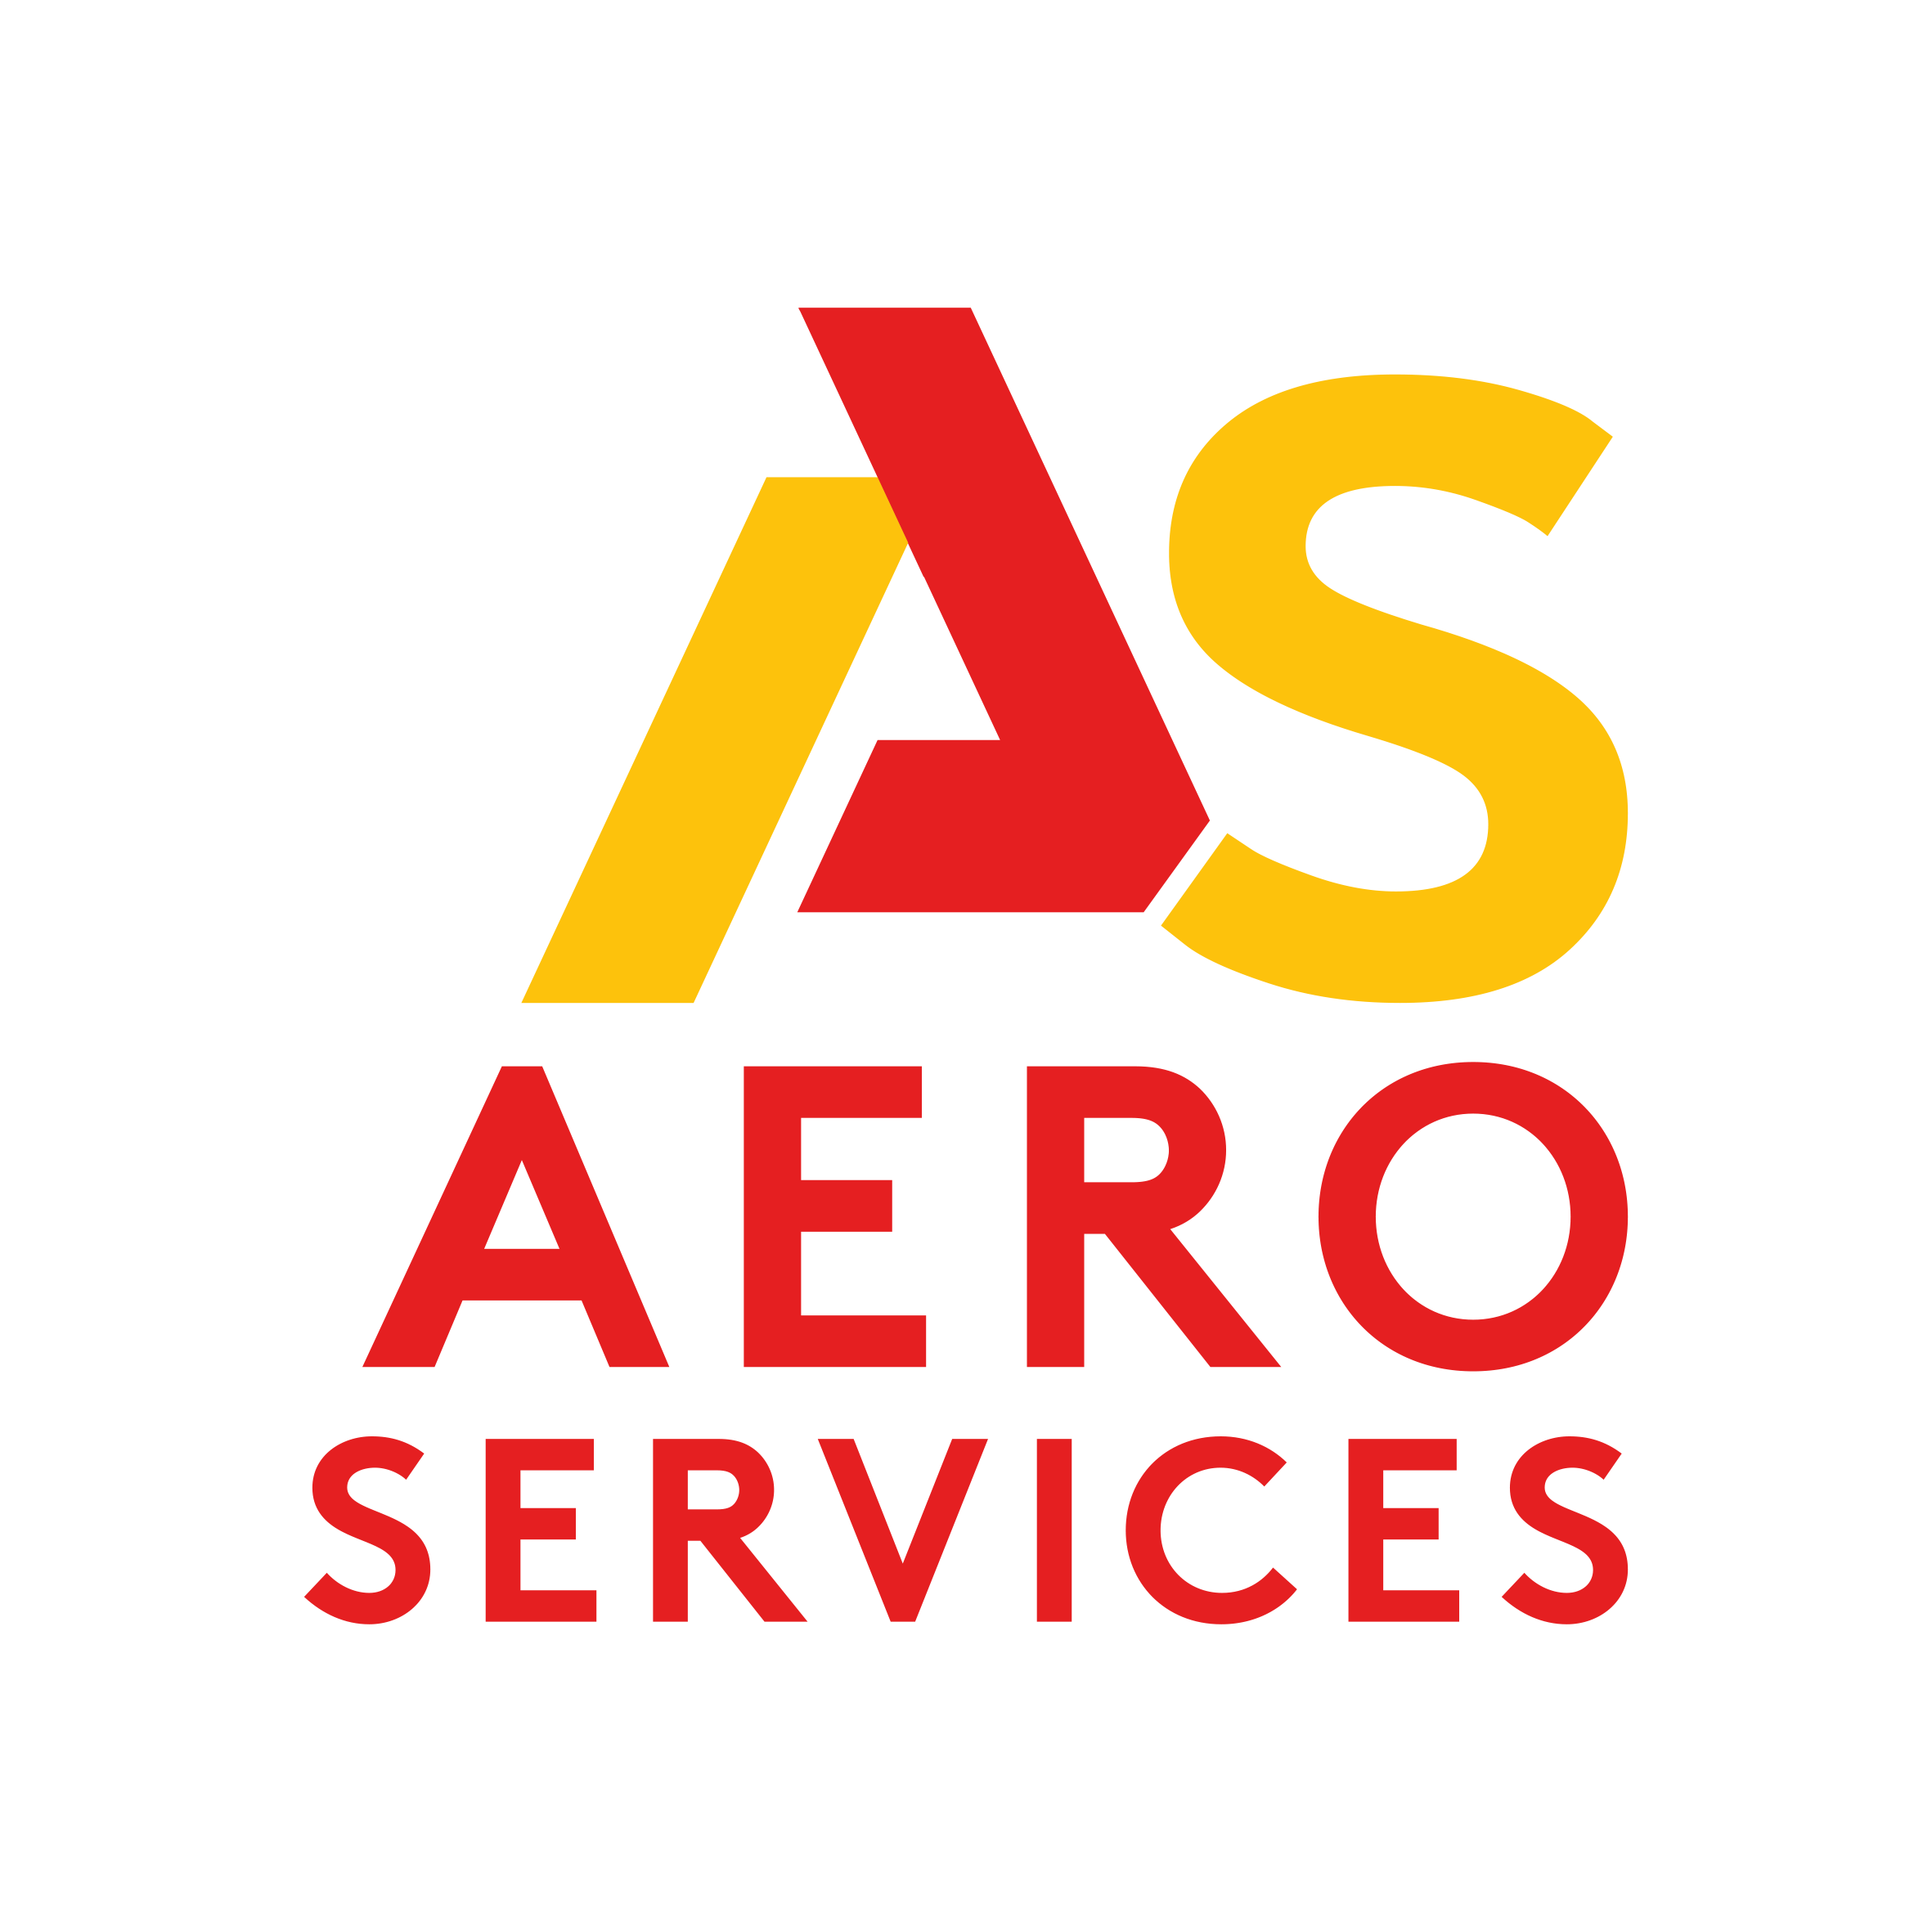 Aero Services SPRL